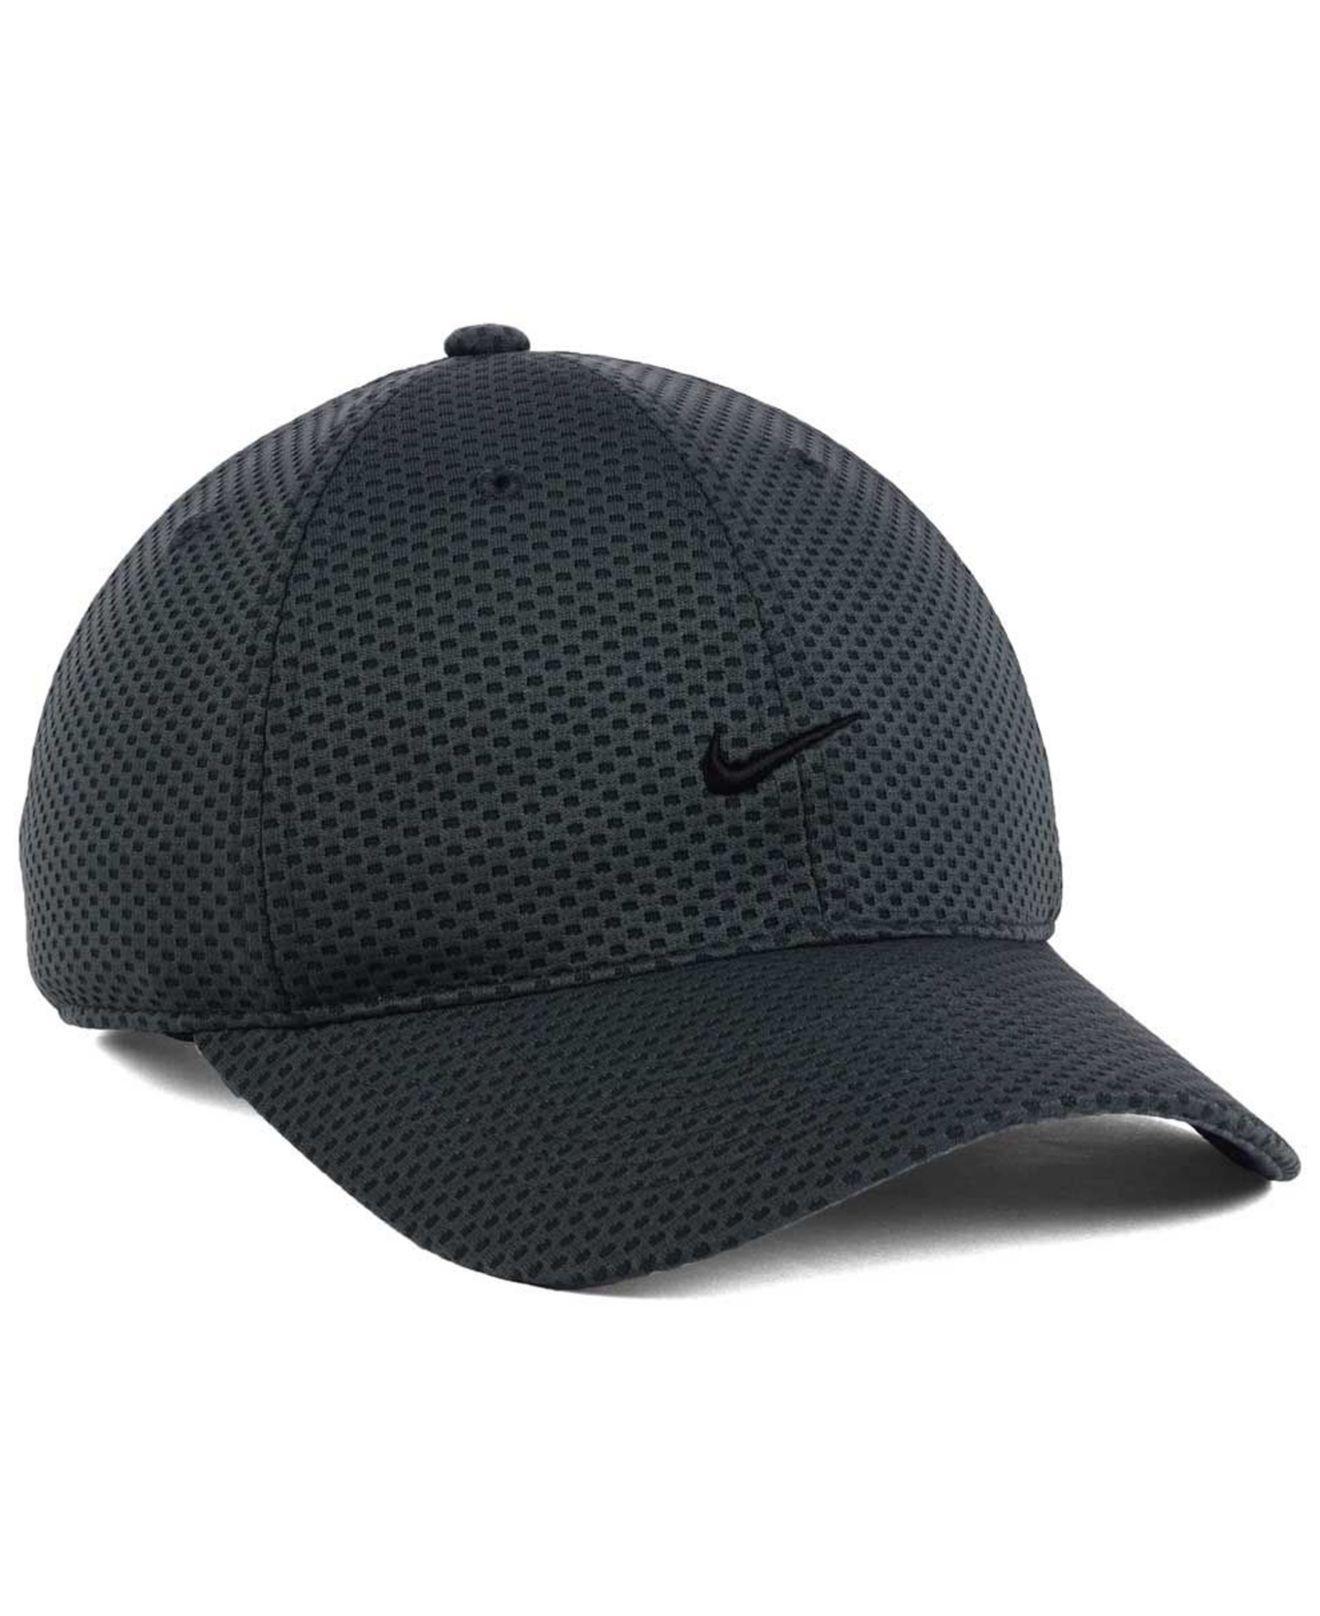 f0c59183cebbf Nike 6 Panel Tailwind Cap in Black for Men - Lyst